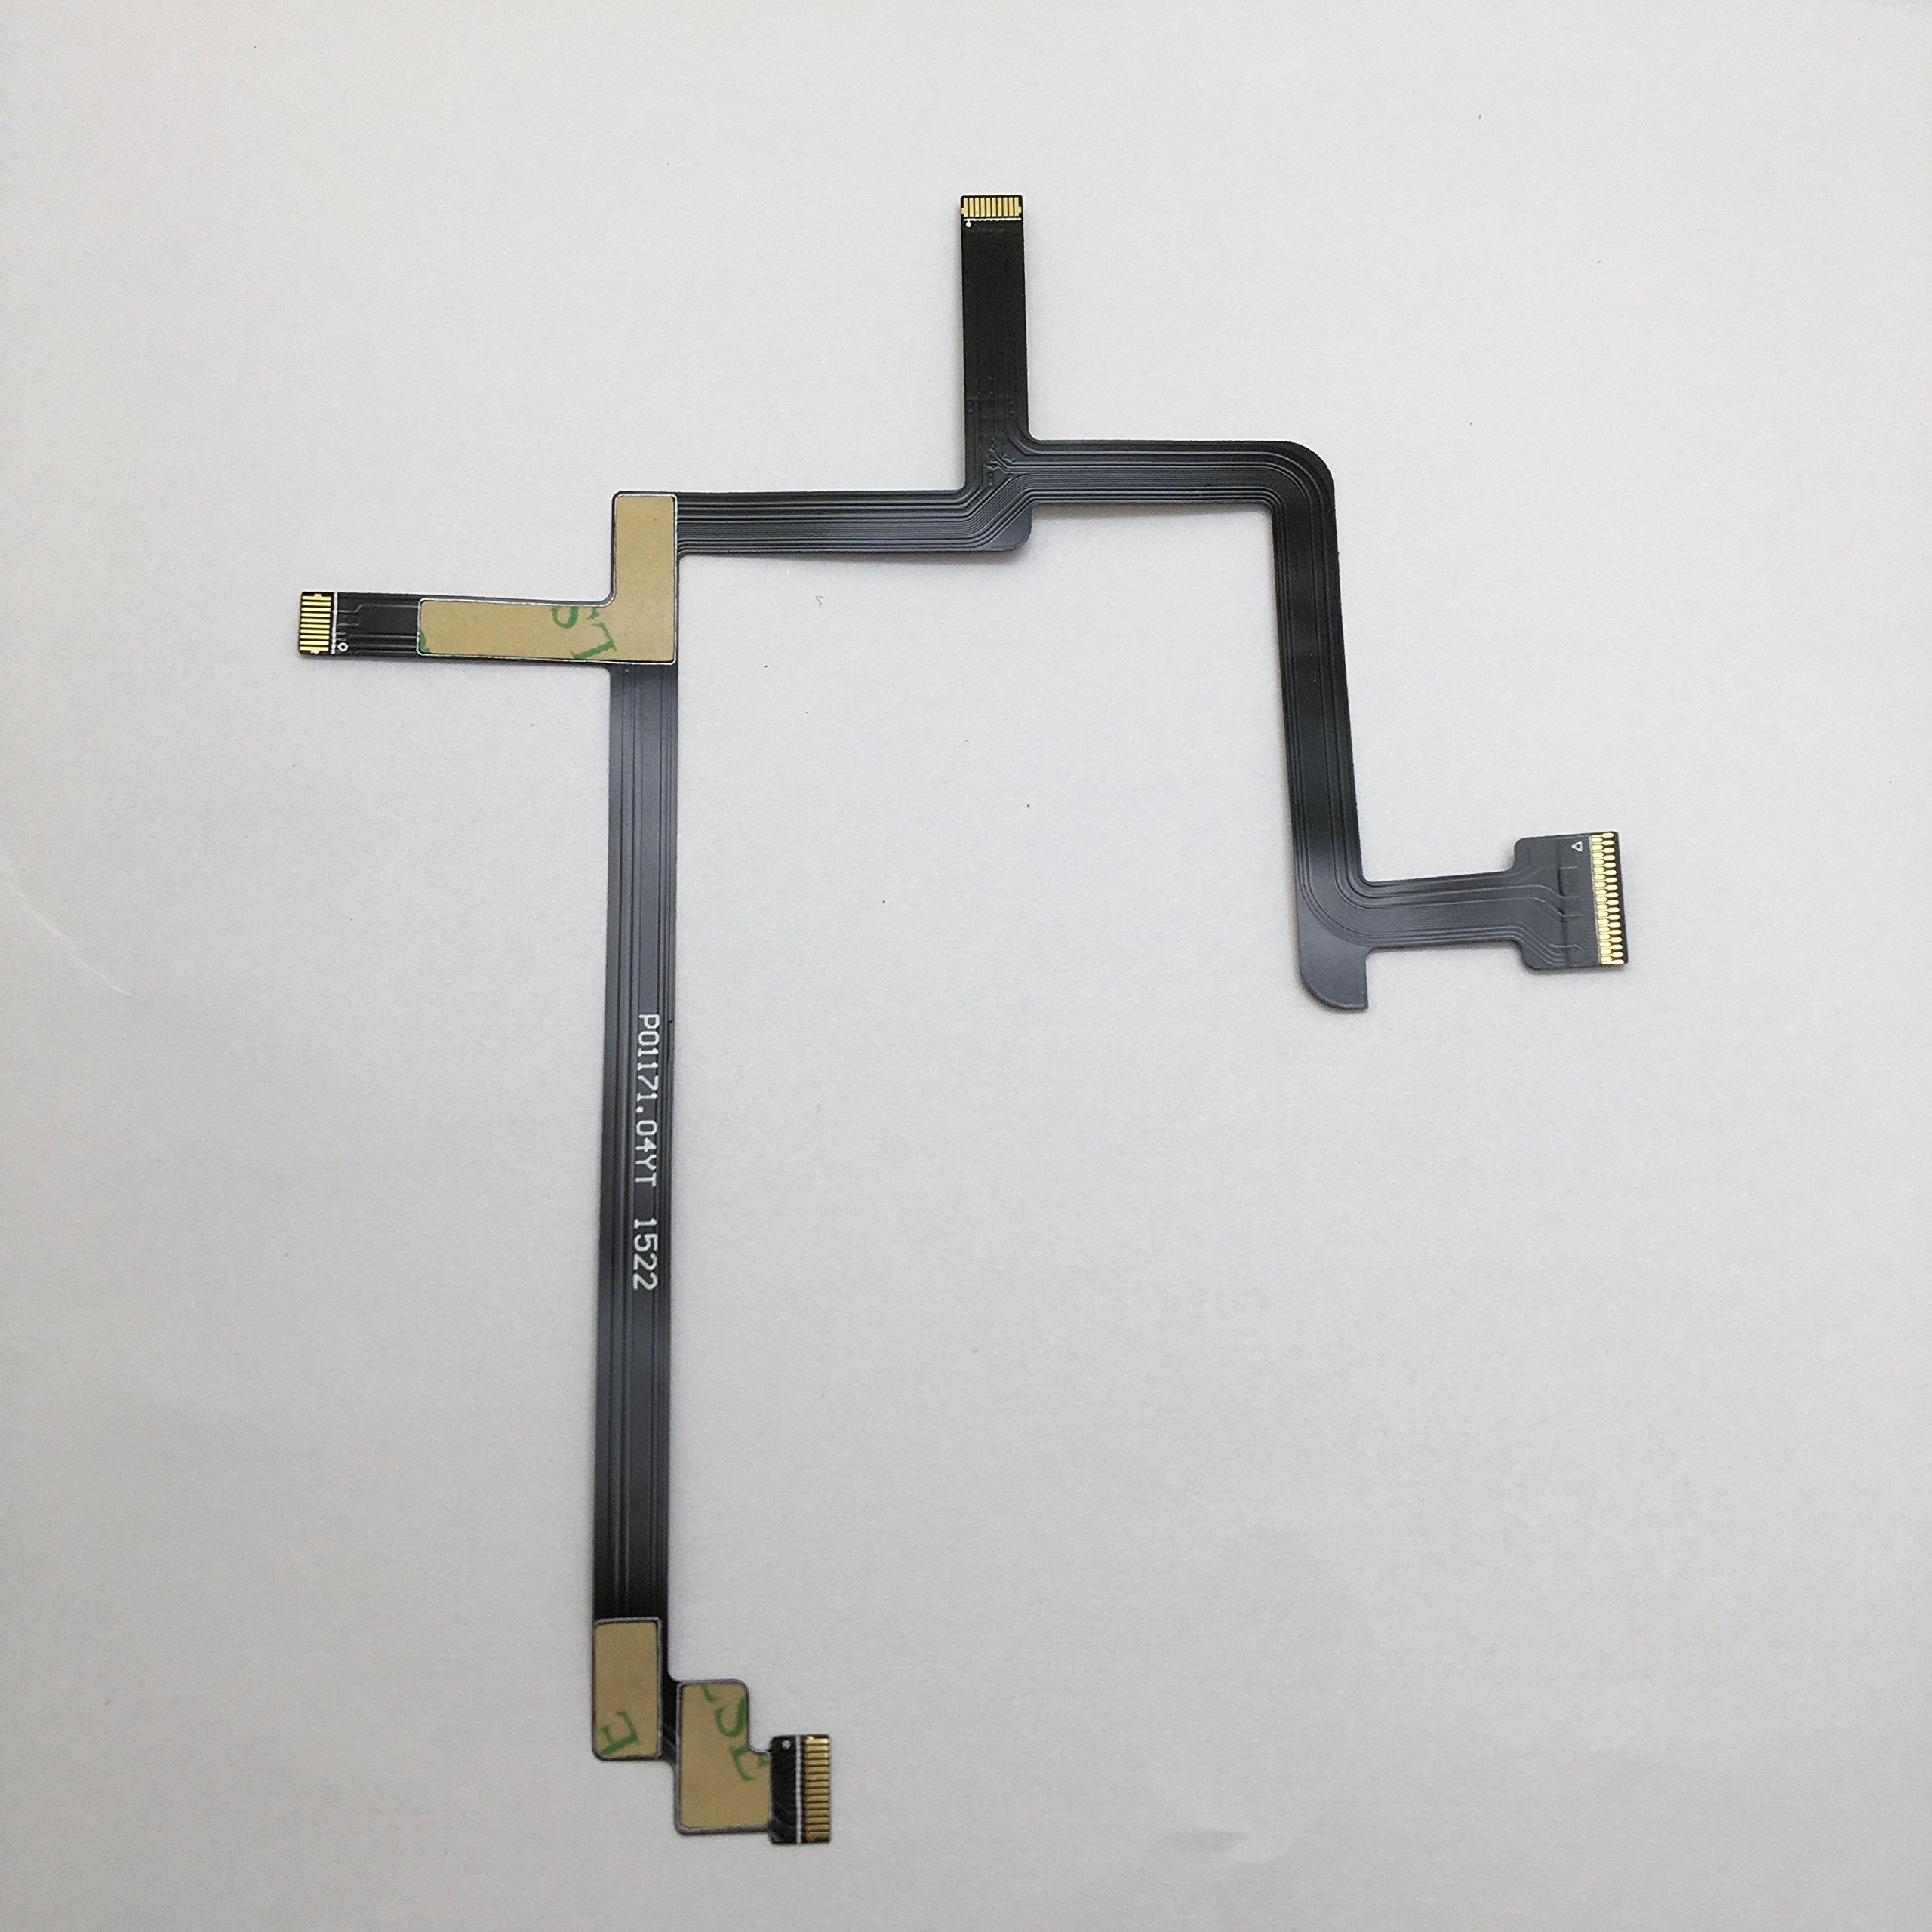 SummitLink Flex Ribbon Cable for DJI Phantom 3 Standard Gimbal Camera Replacement